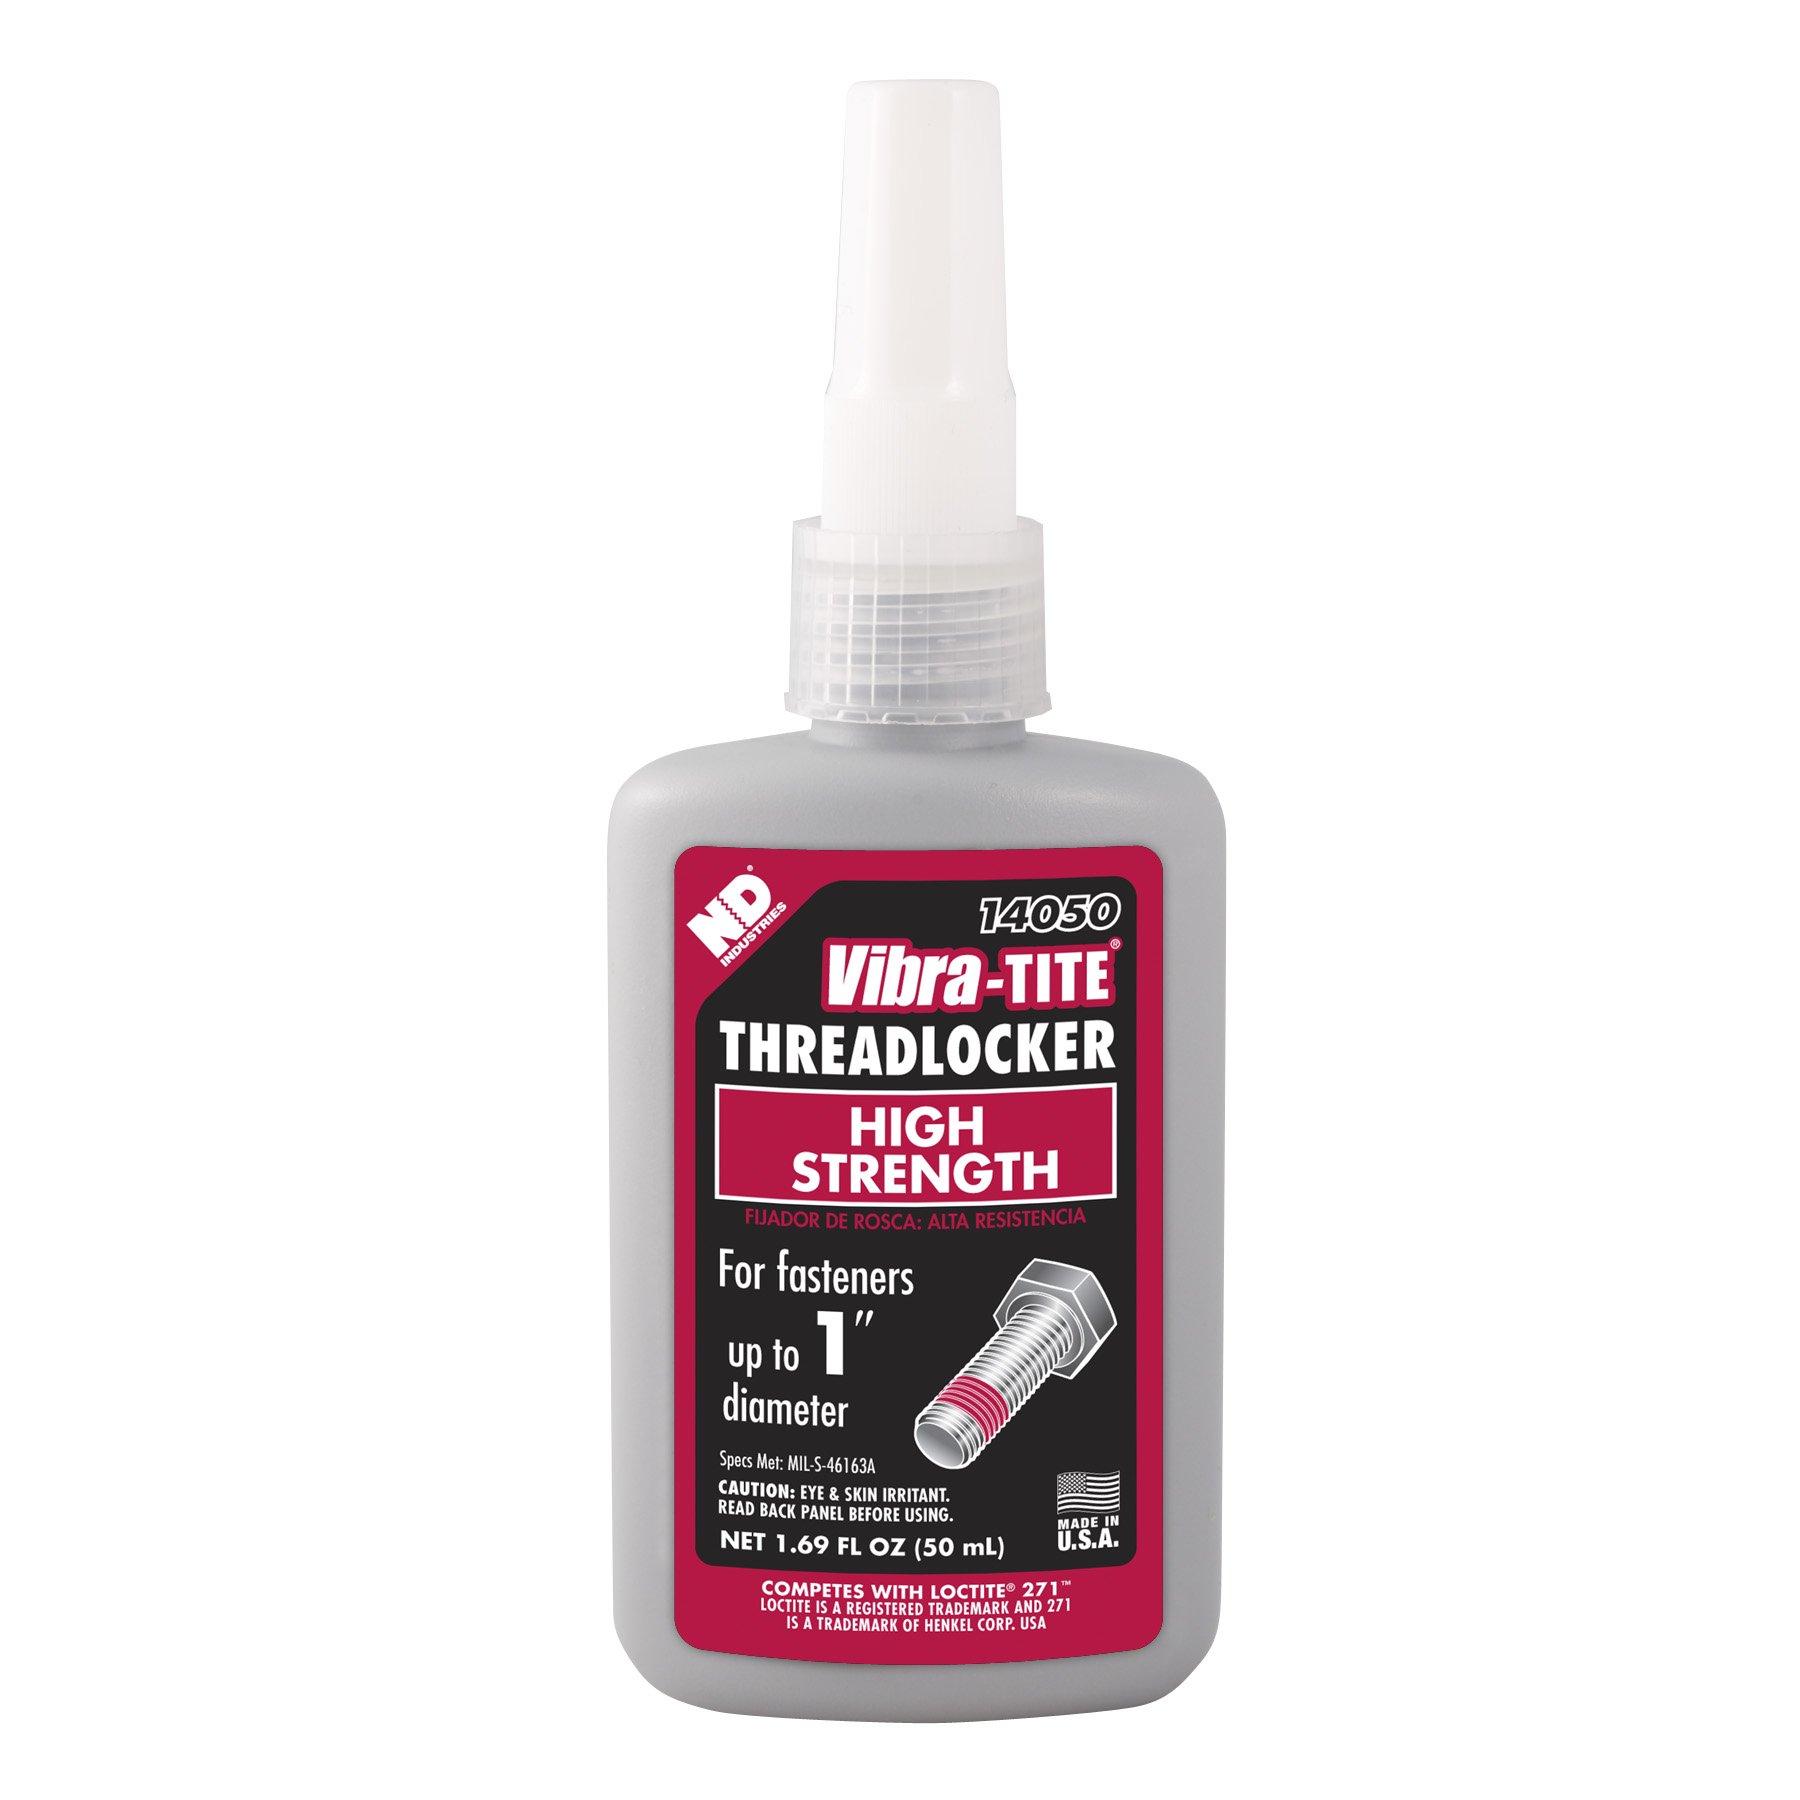 Vibra-TITE 140 Permanent High Strength Anaerobic Threadlocker, 50 ml Bottle, Red